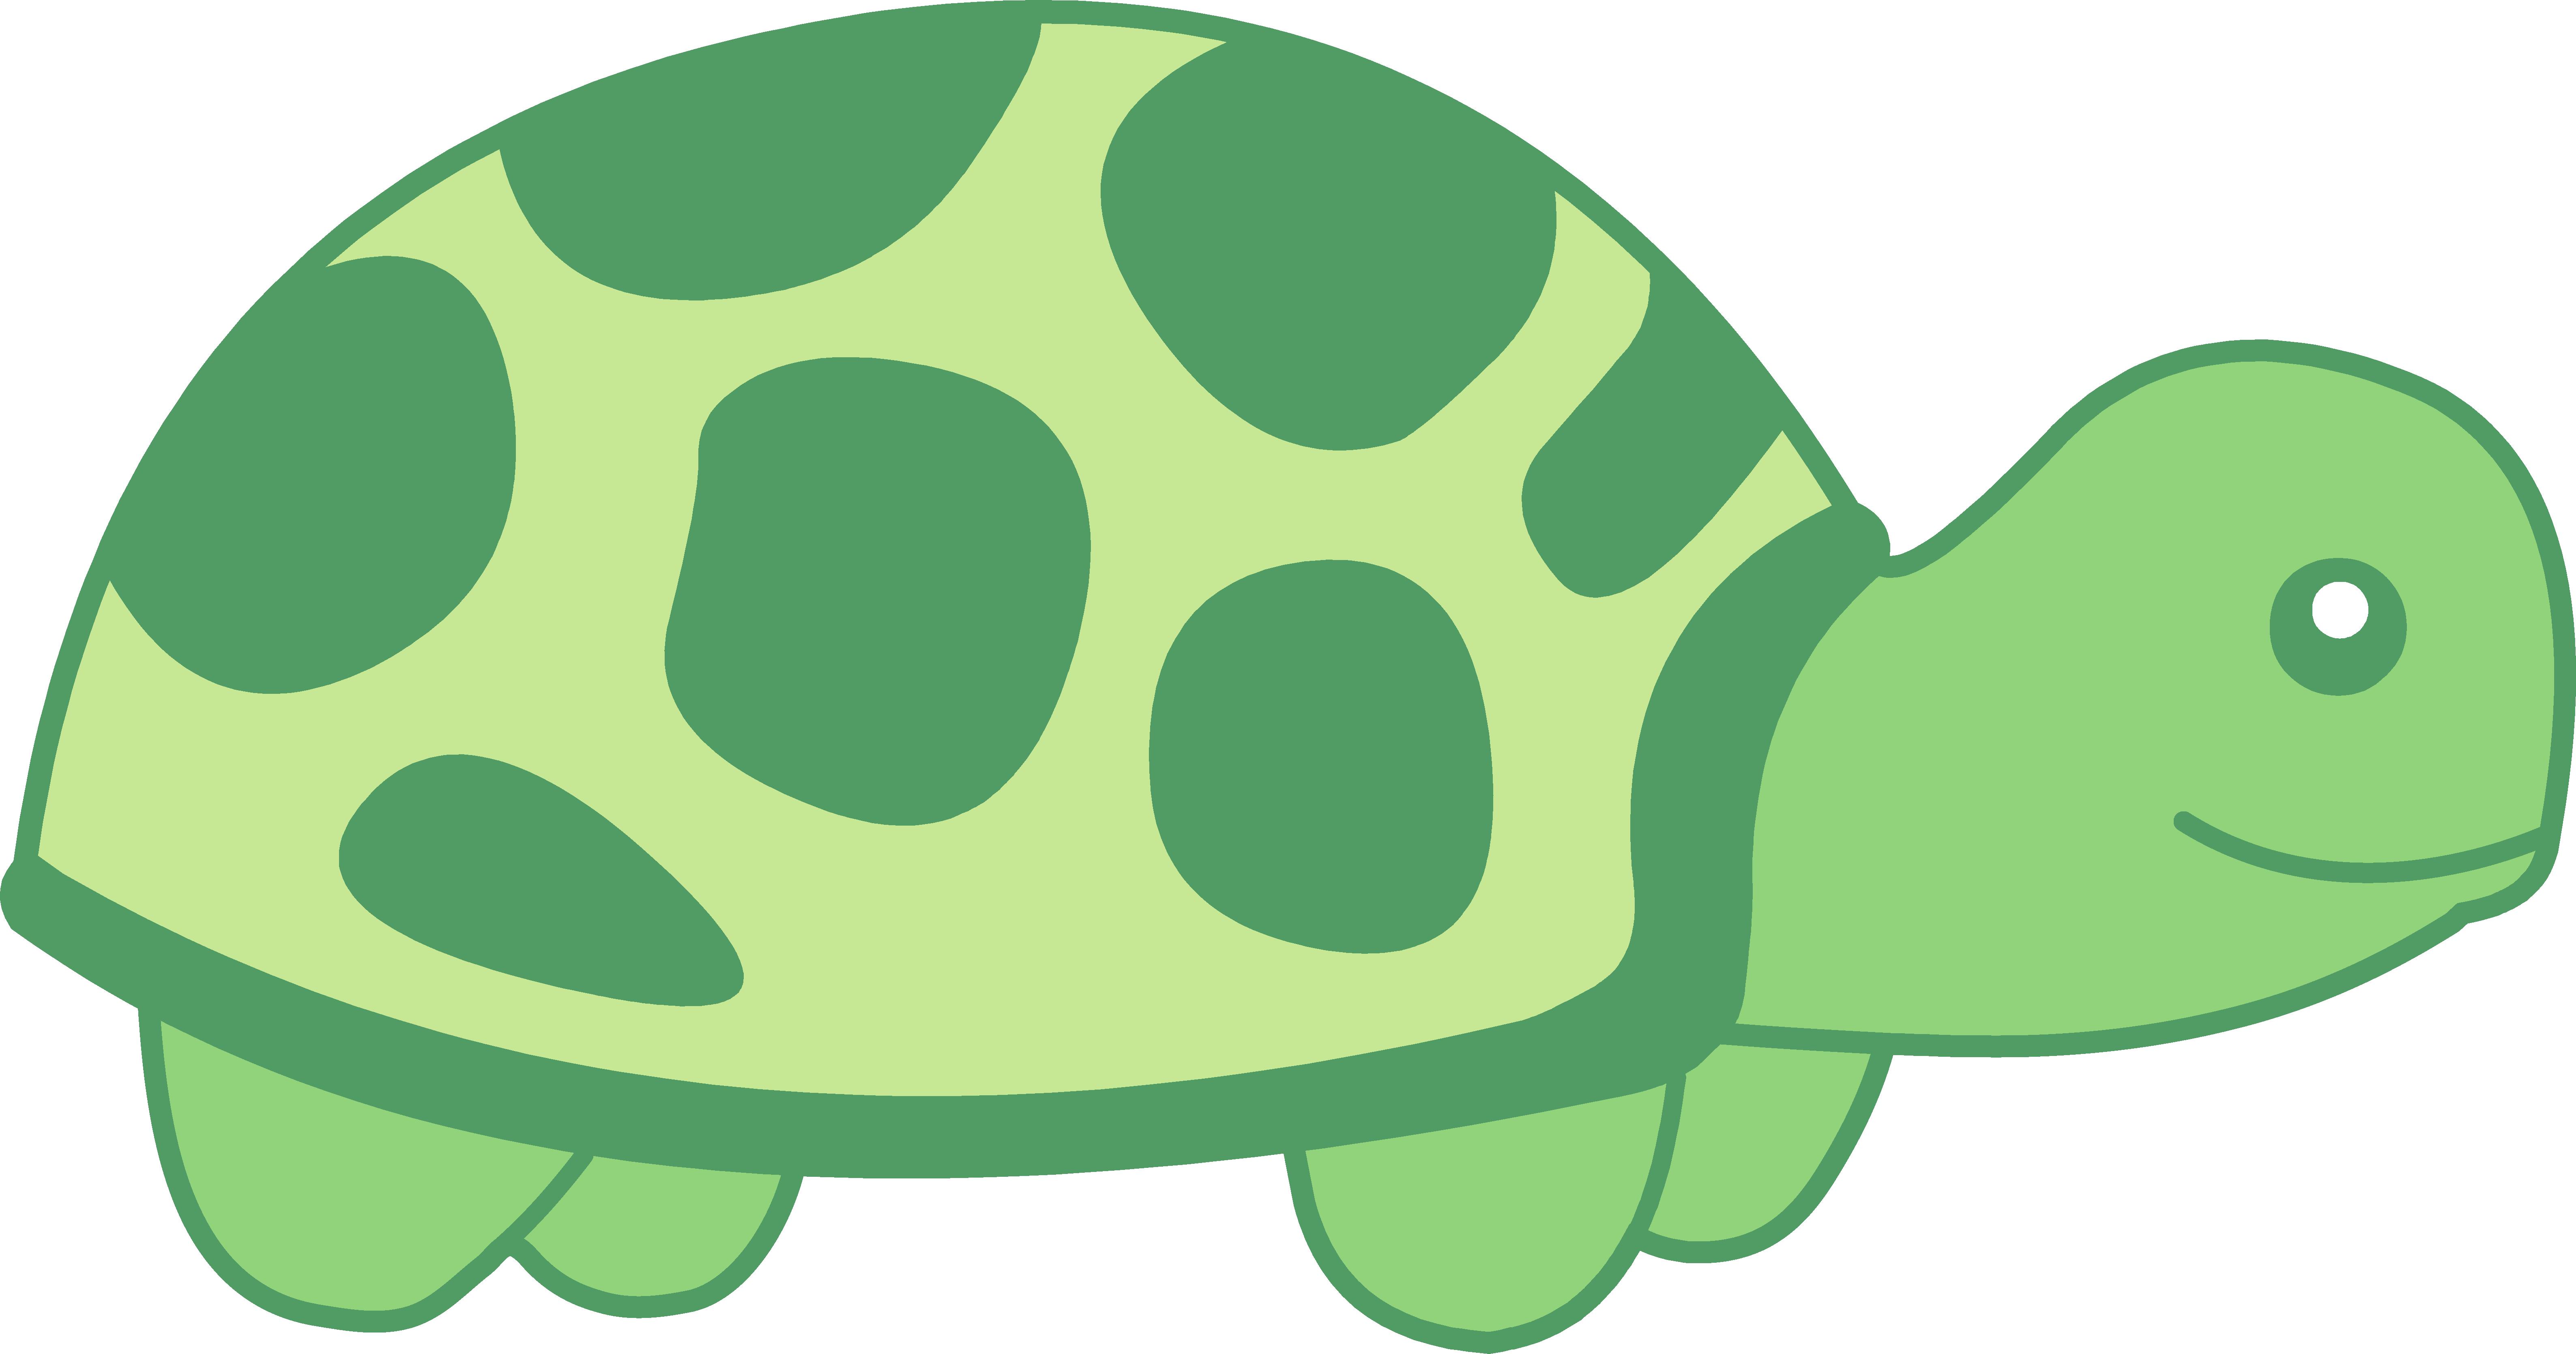 Turtle Clip Art Free | Clipart Panda - Free Clipart Images